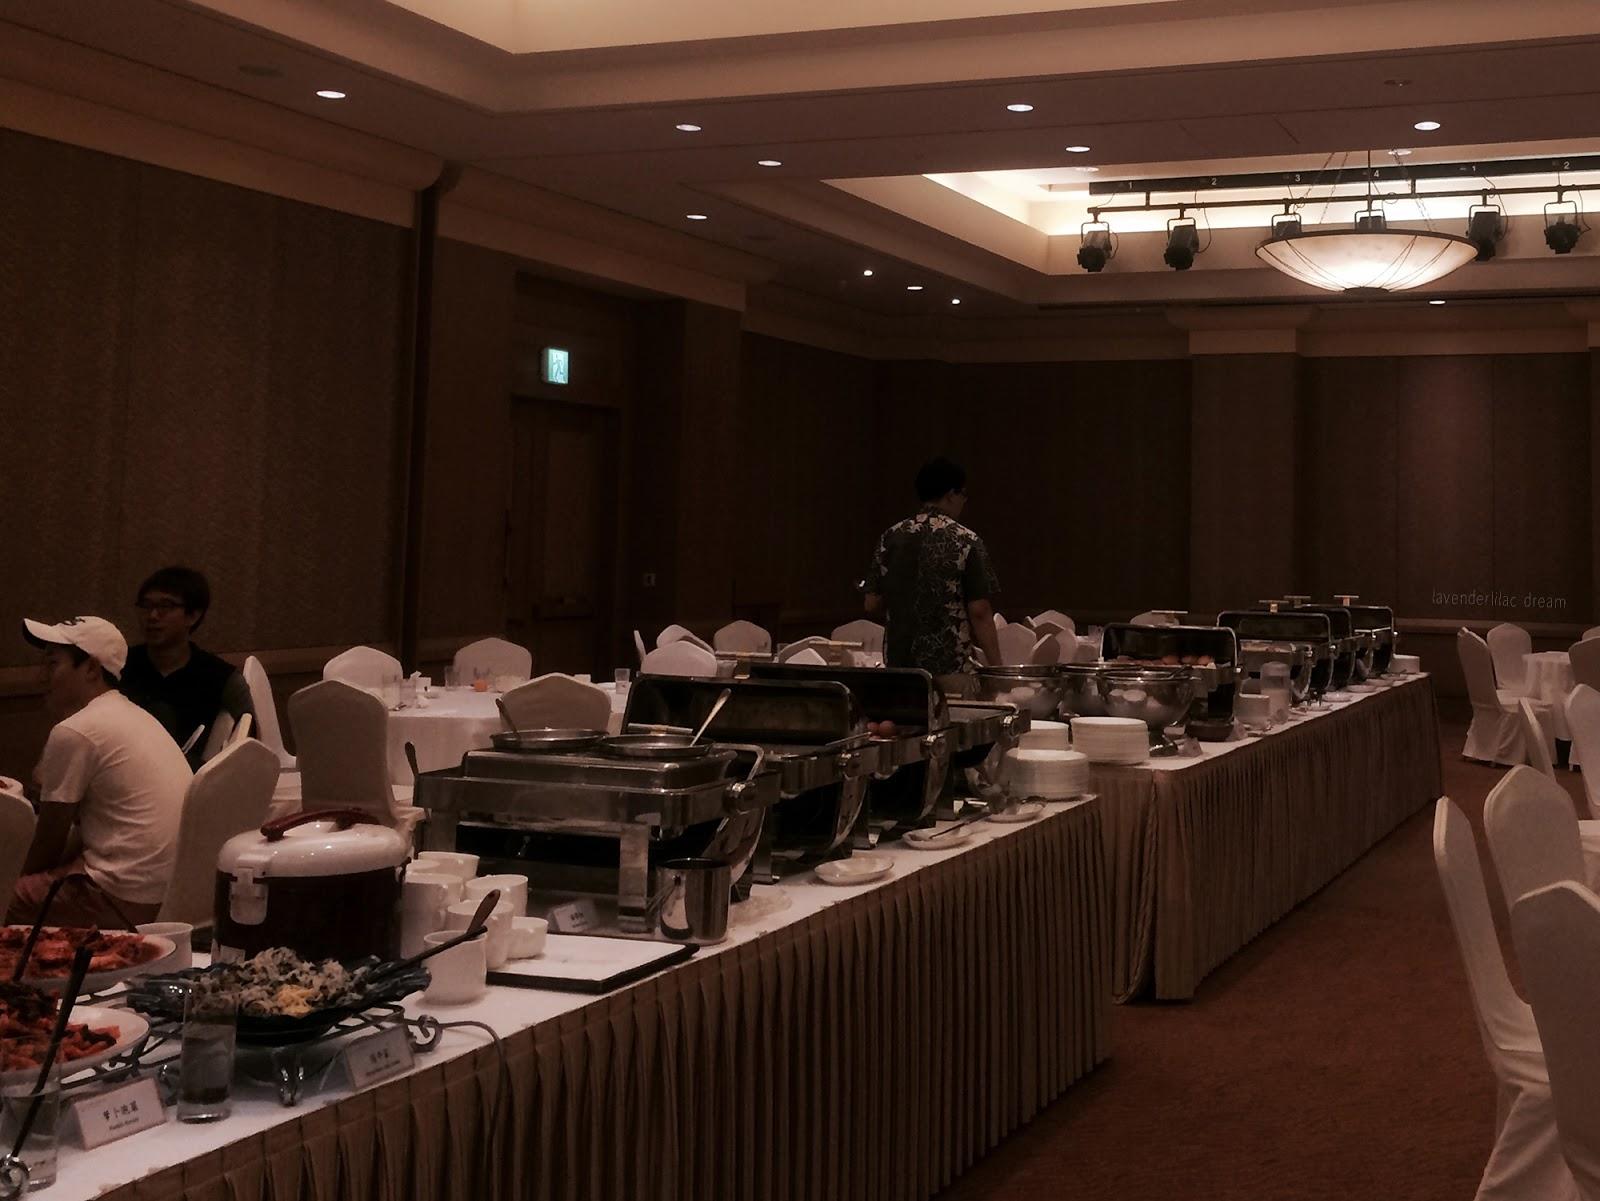 South Korea, Jeju Island, Yonsei University, YISS 2014, Teddy Valley Golf & Resort, Breakfast buffet